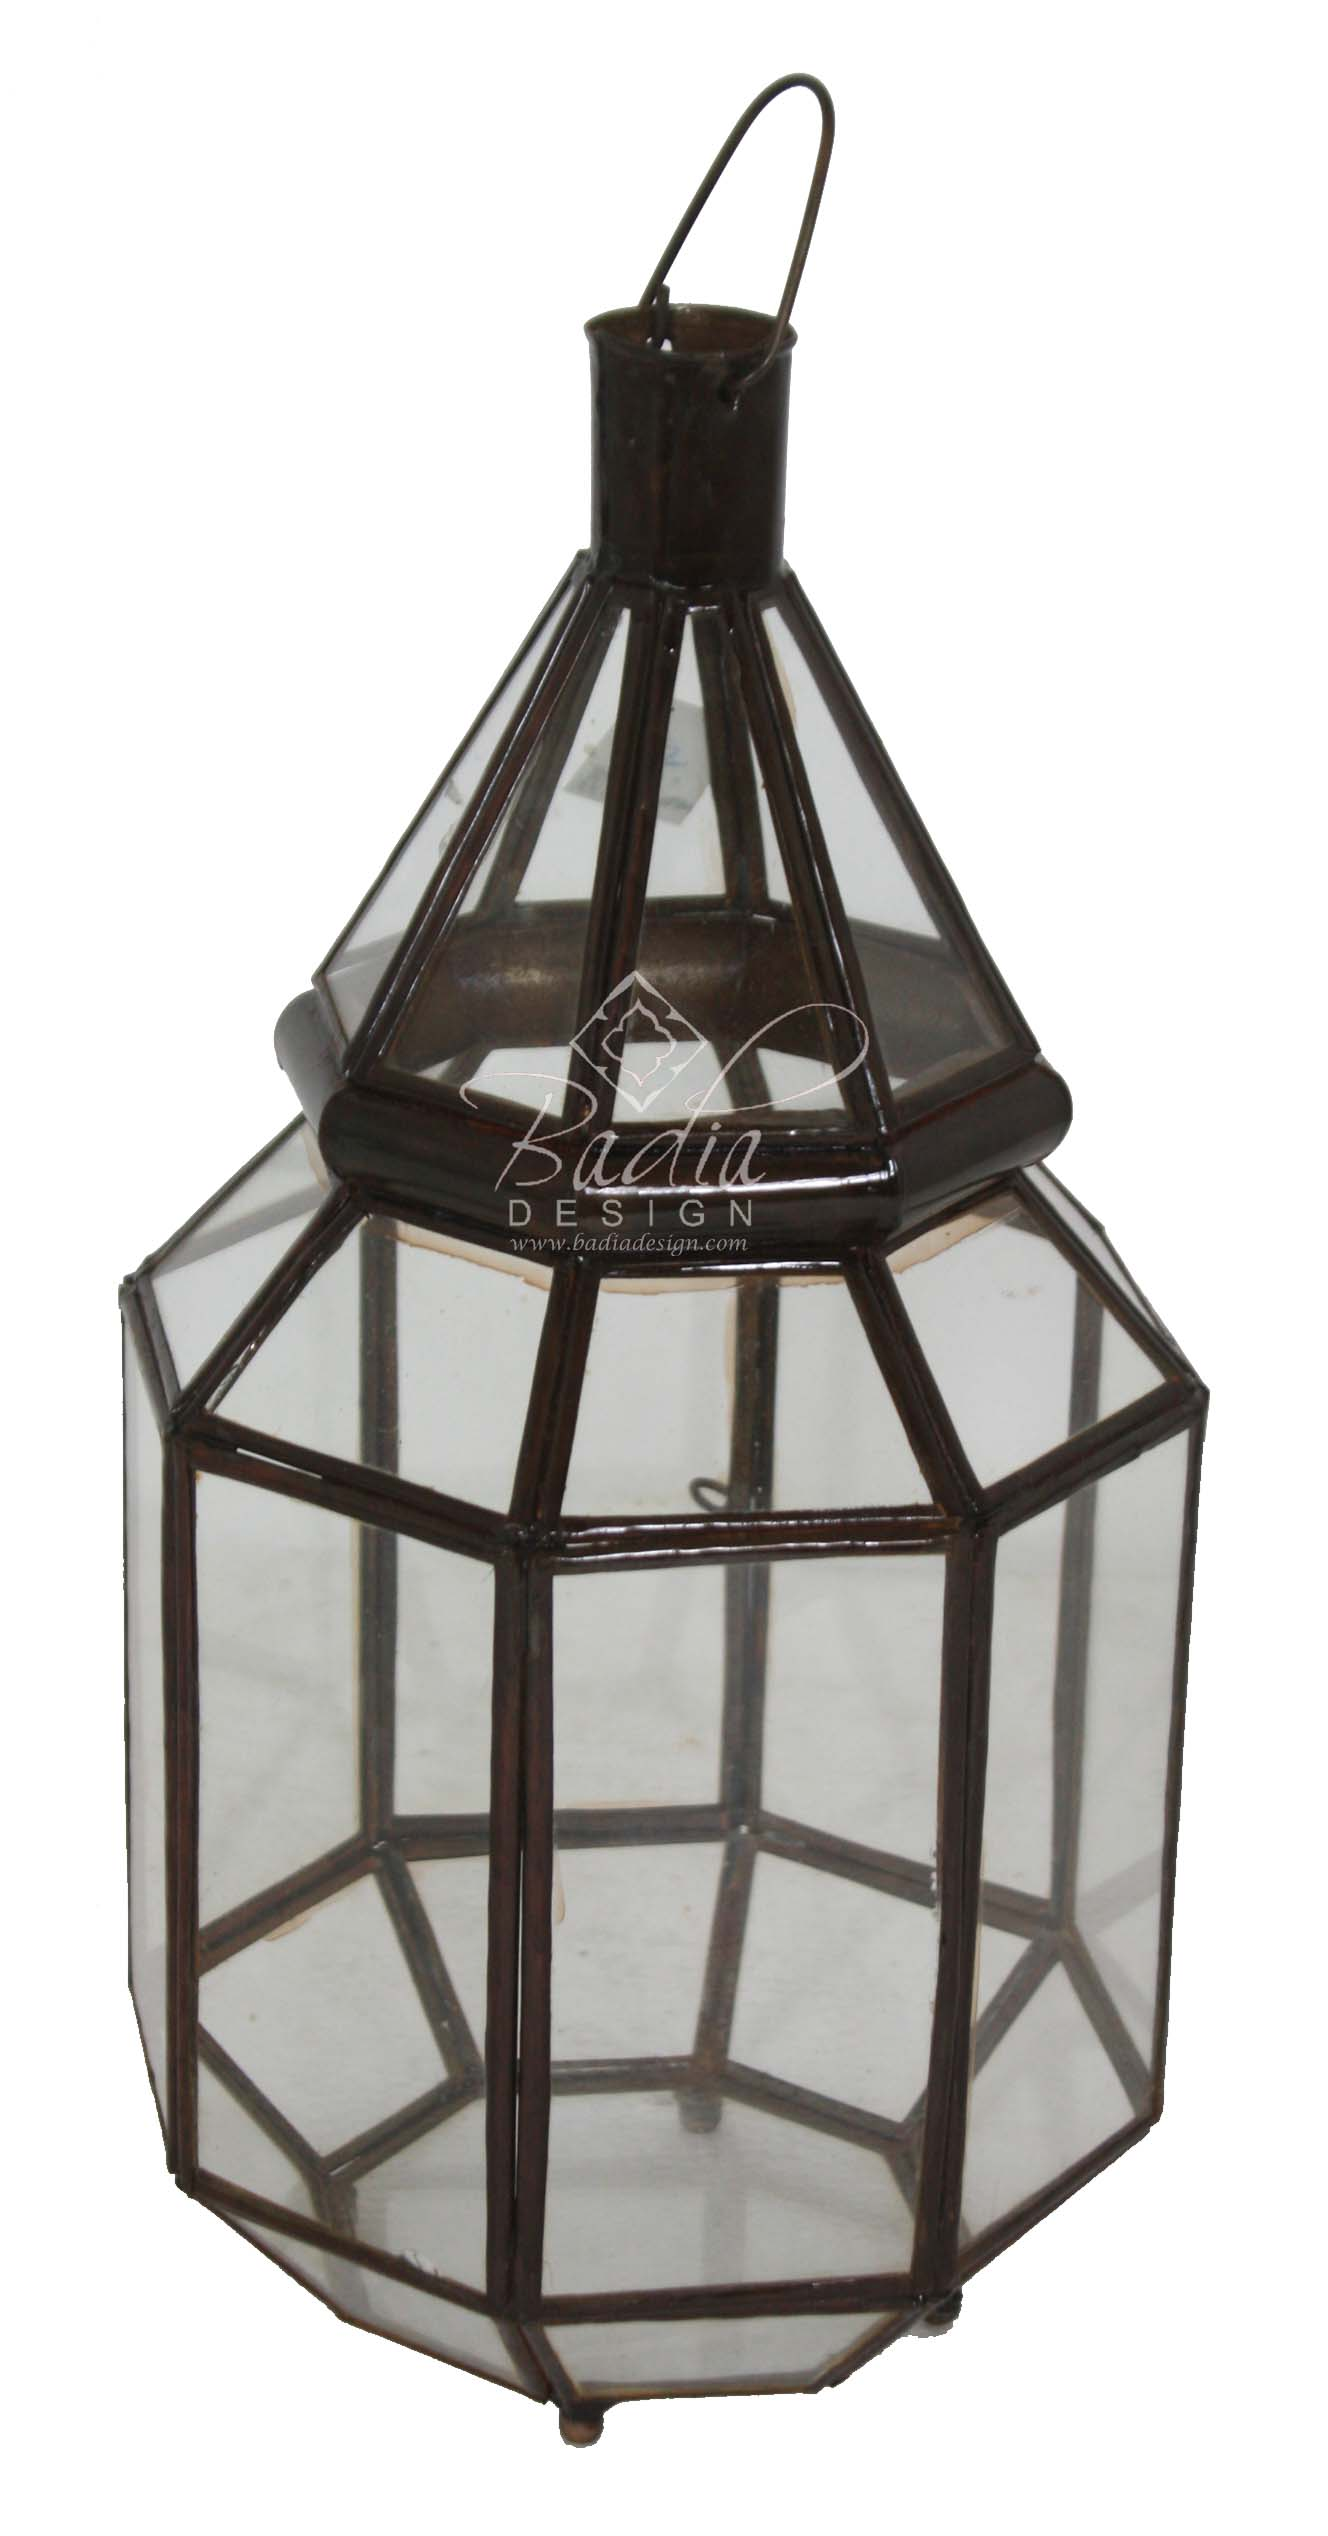 moroccan-clear-glass-floor-lantern-lig361-1.jpg